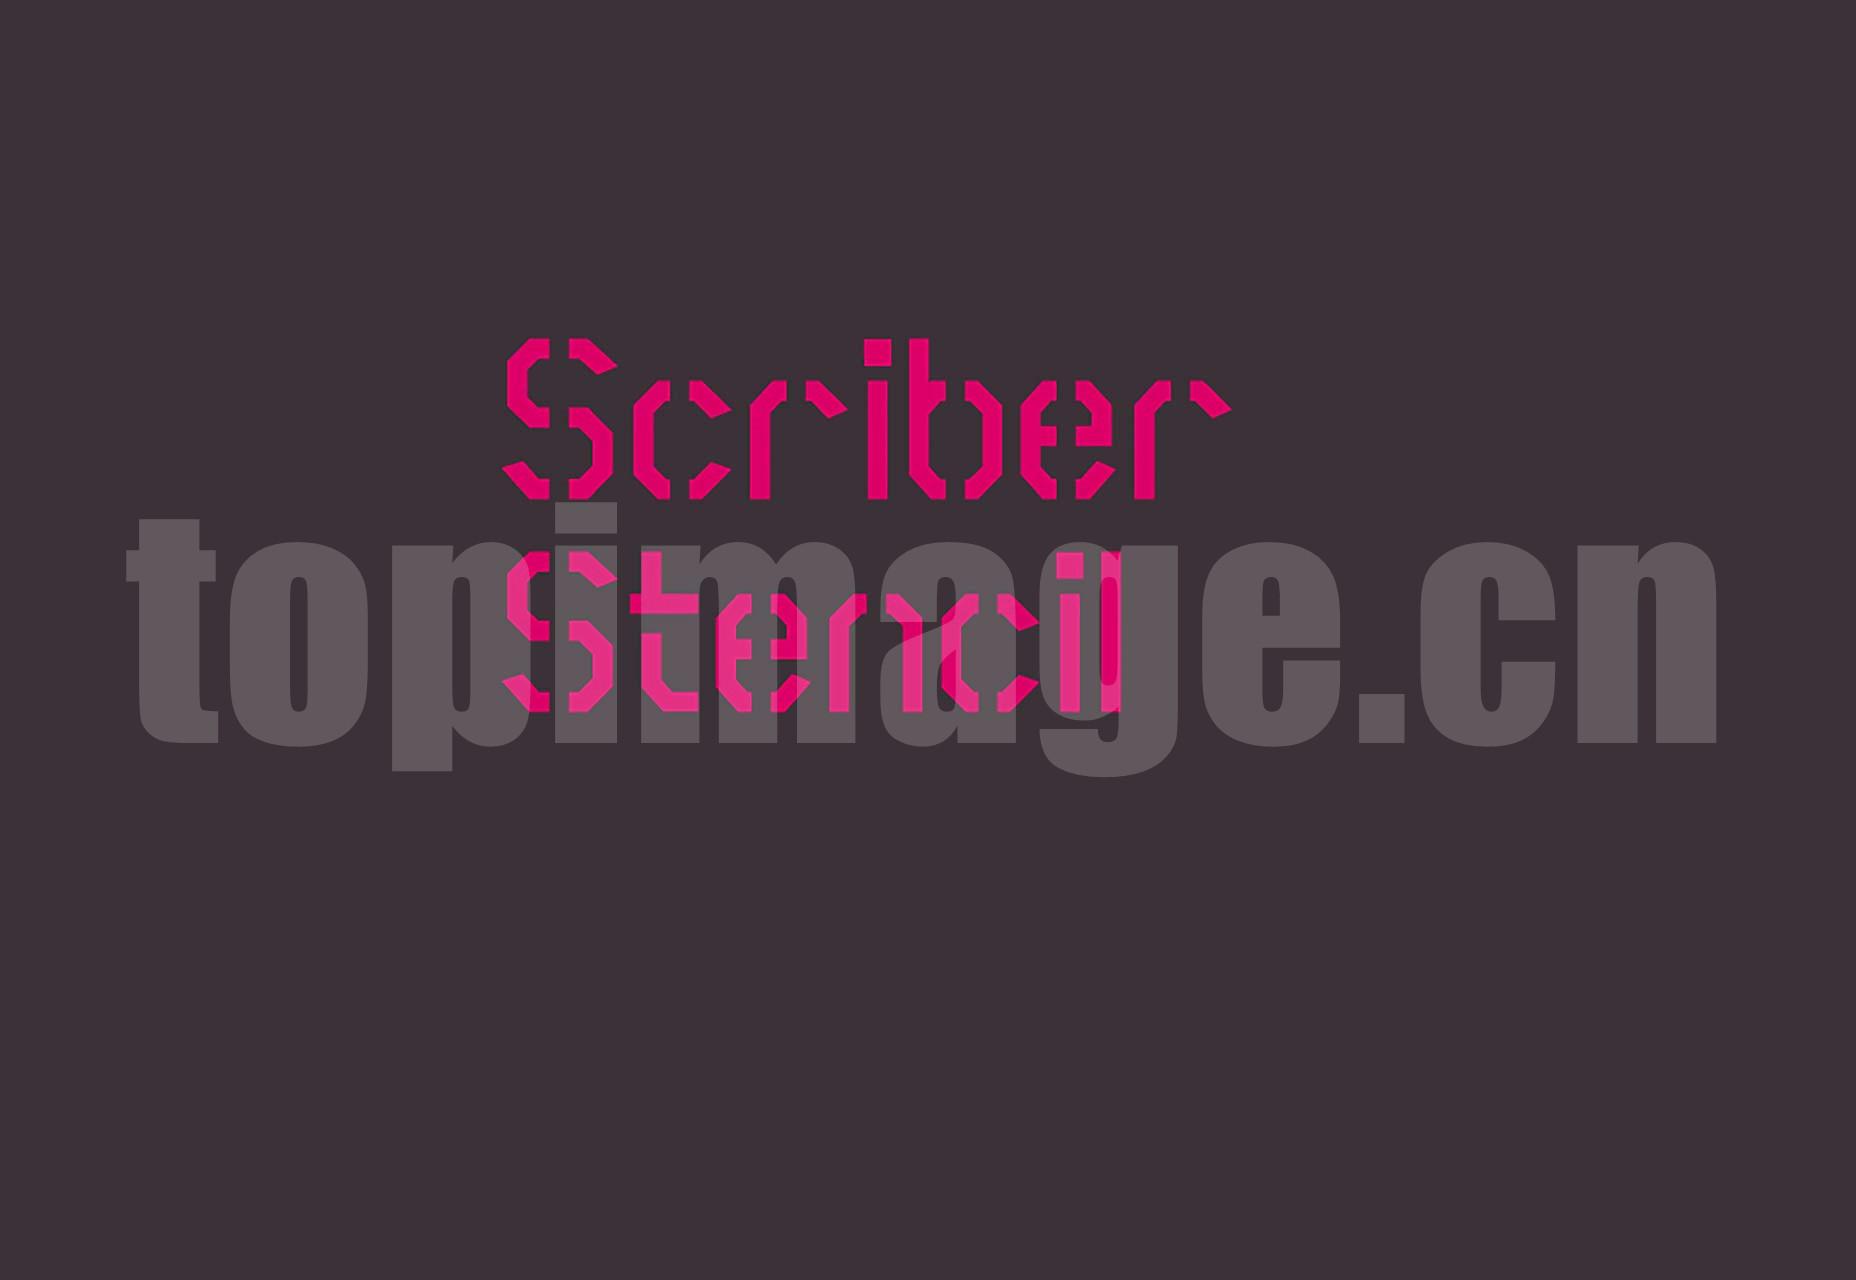 Scriber Bold Stencil 海报创意 个性字体设计 简约时尚 英文字体下载